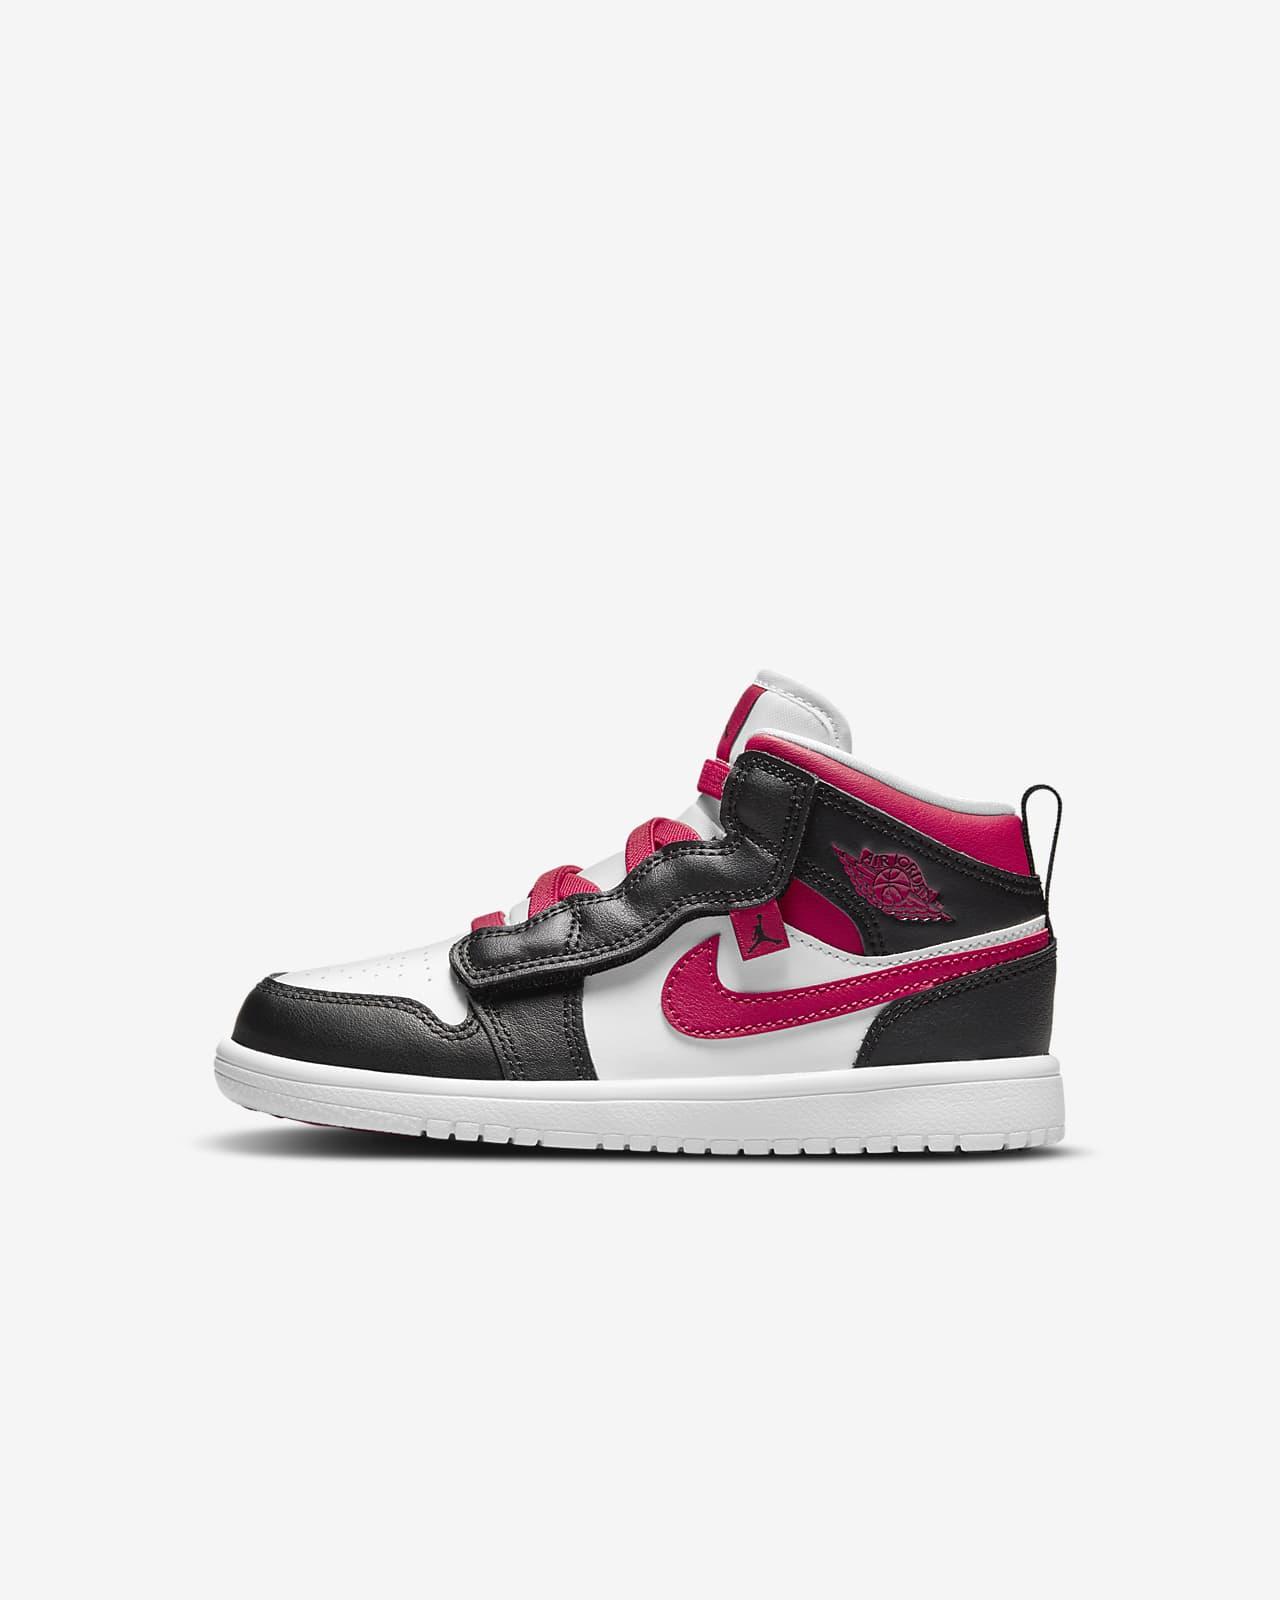 Jordan 1 Mid Younger Kids' Shoes